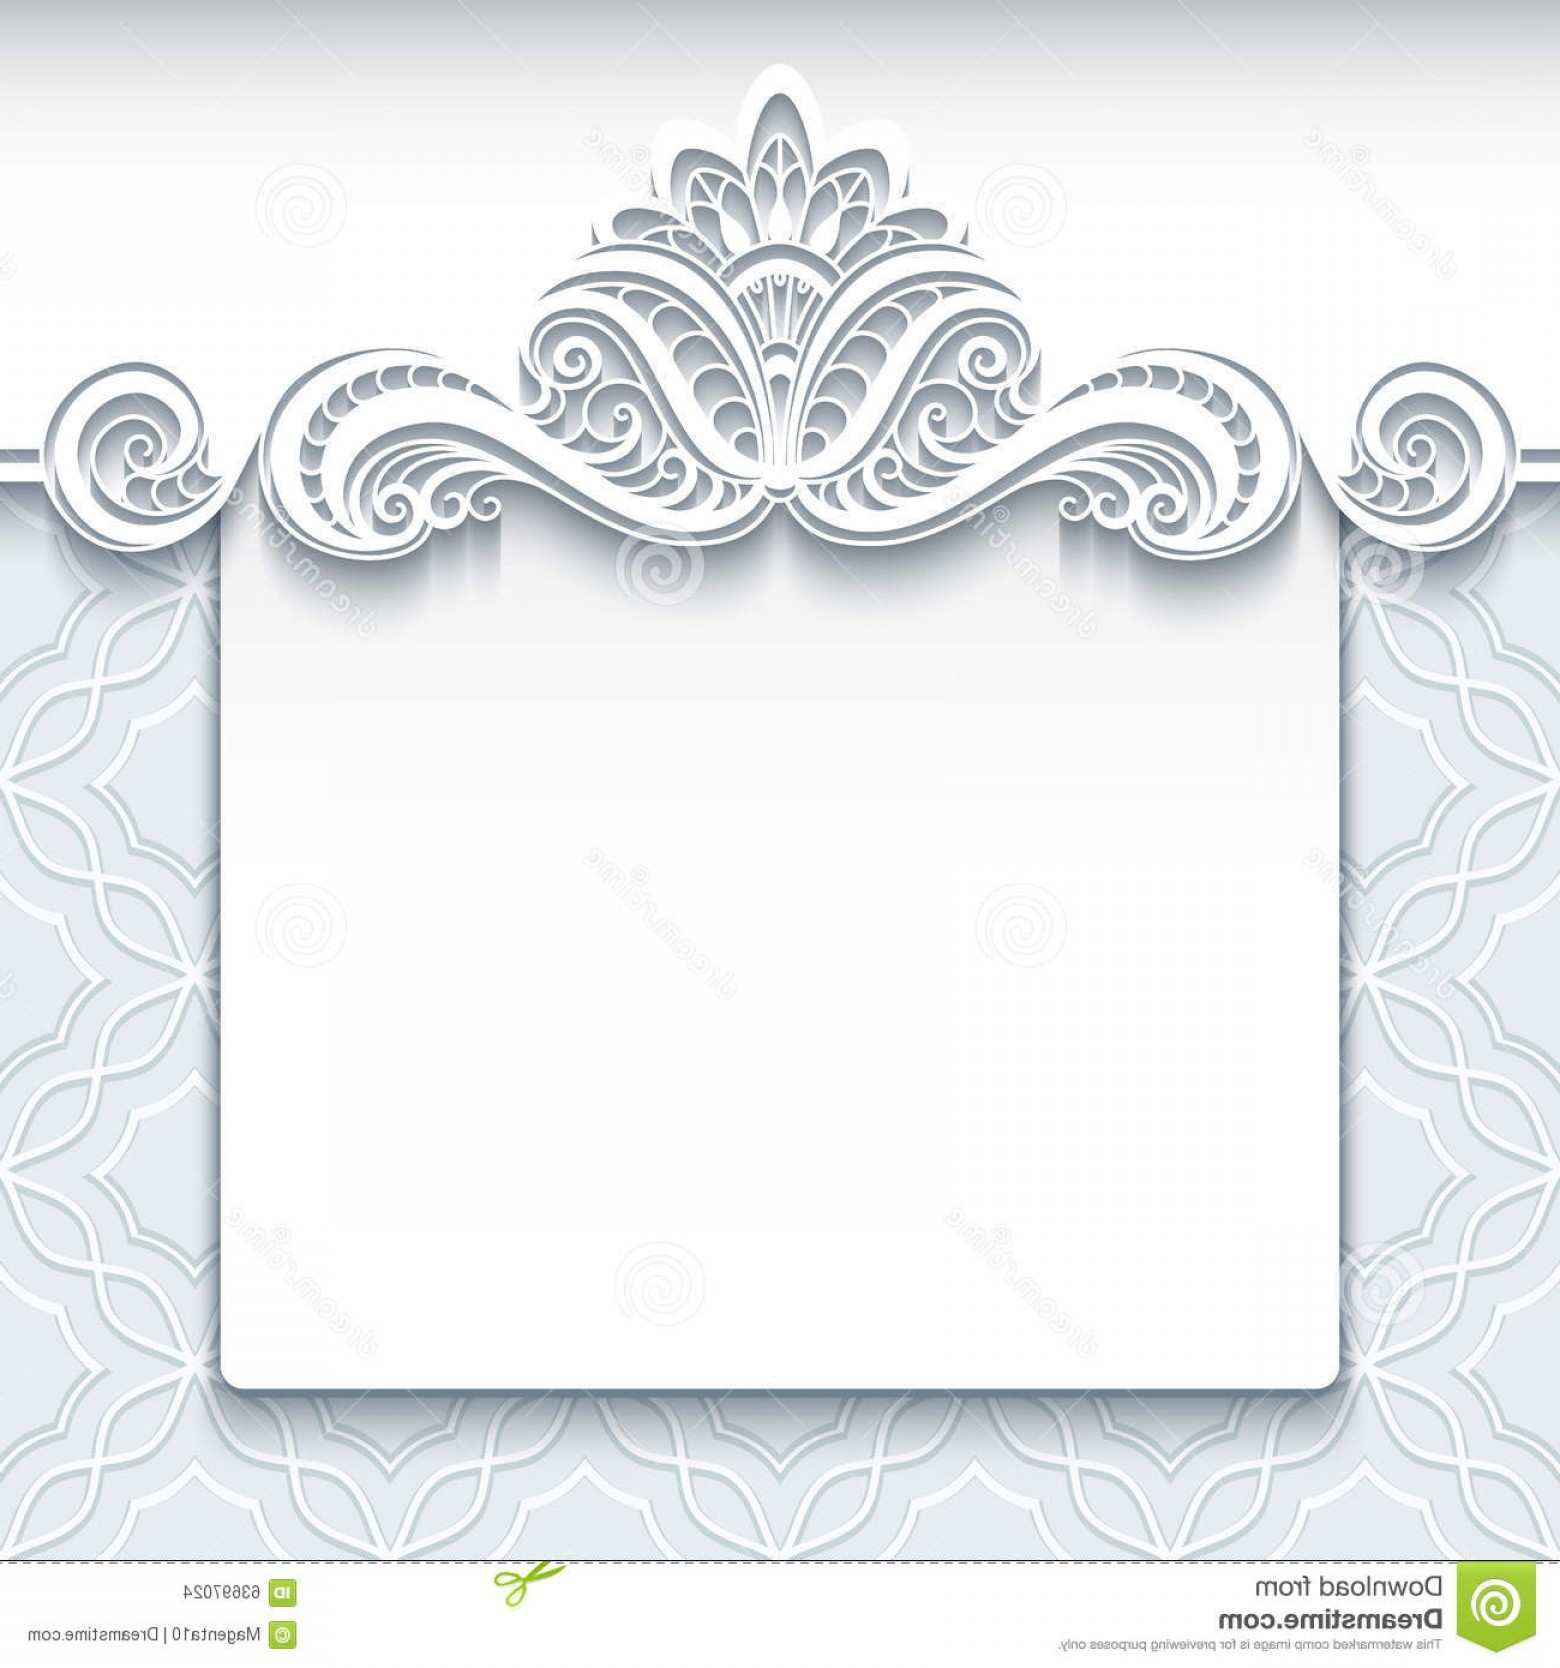 82 Creating Elegant Wedding Invitation Designs Free With Stunning Design by Elegant Wedding Invitation Designs Free